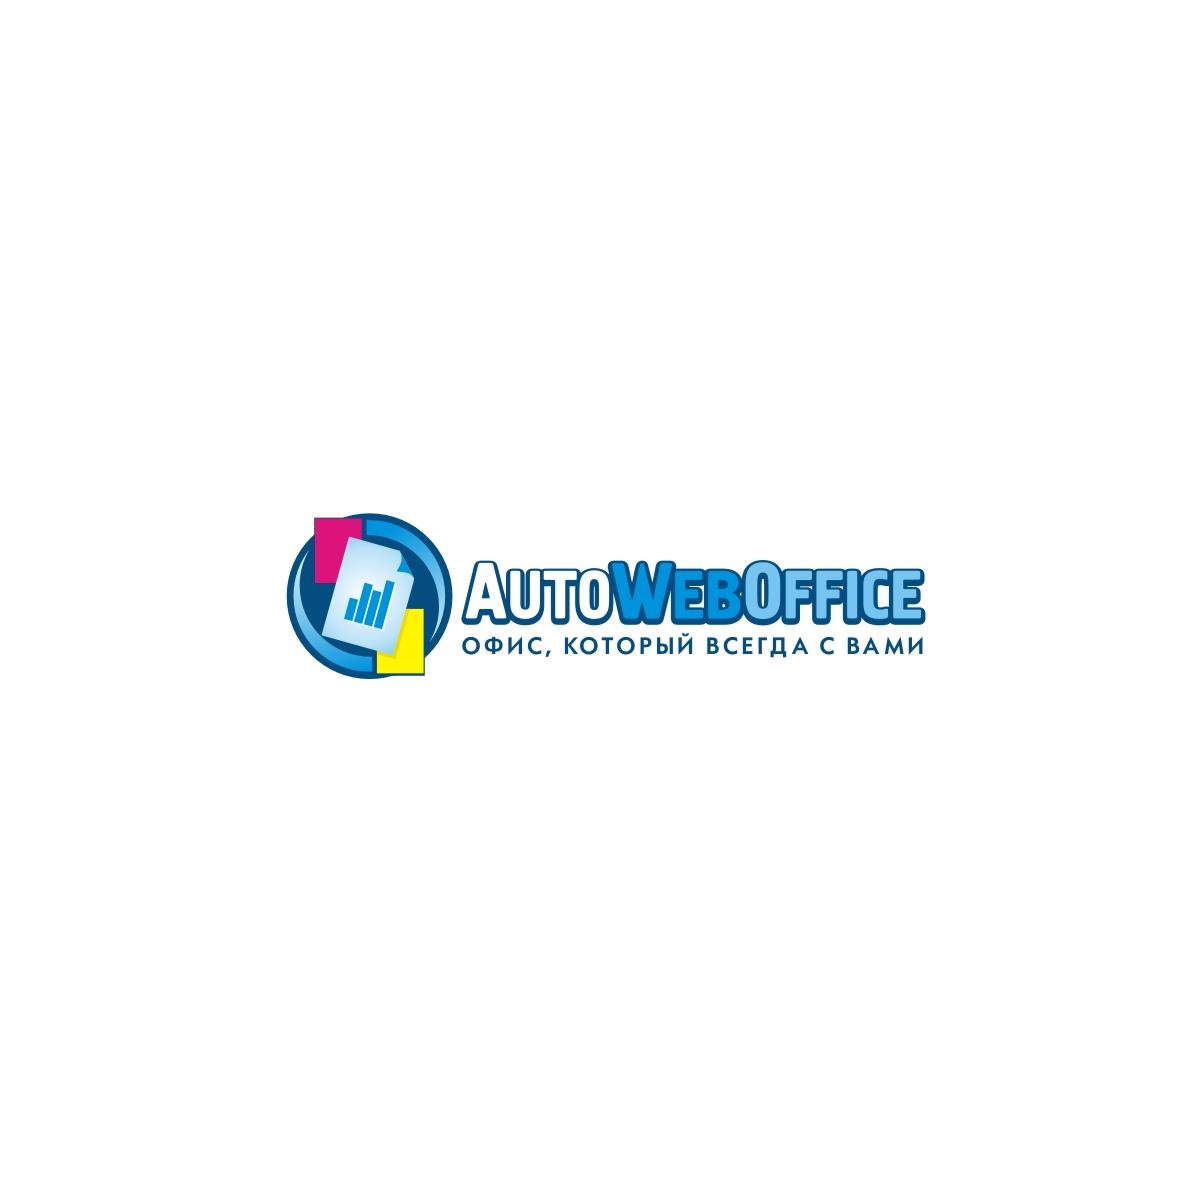 нужно разработать логотип компании фото f_8195579ee28e9922.jpg